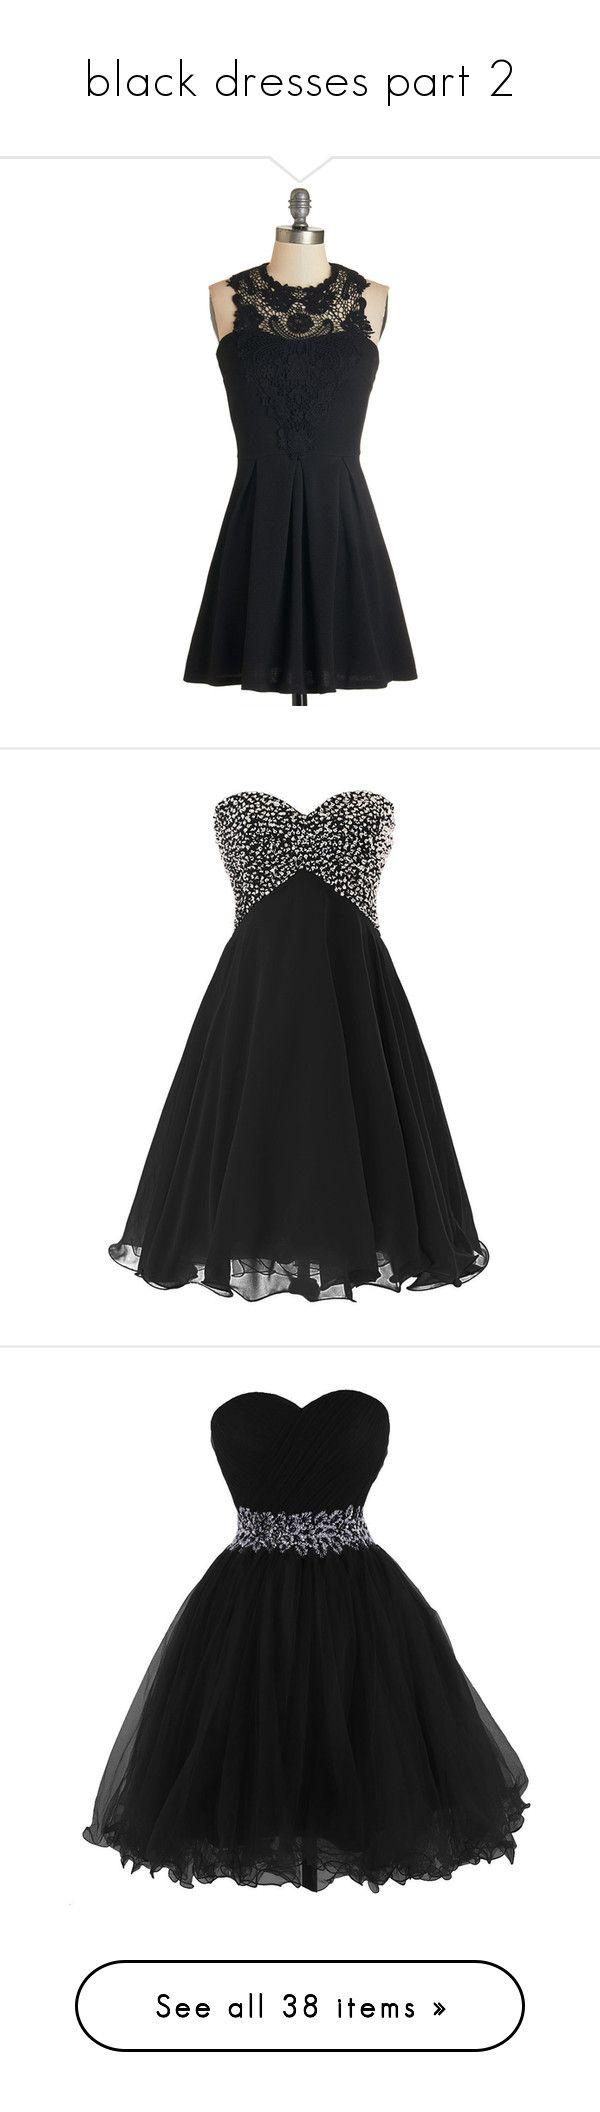 Black dress halter neck -  Black Dresses Part 2 By Megsjessd99 Liked On Polyvore Featuring Dresses Black